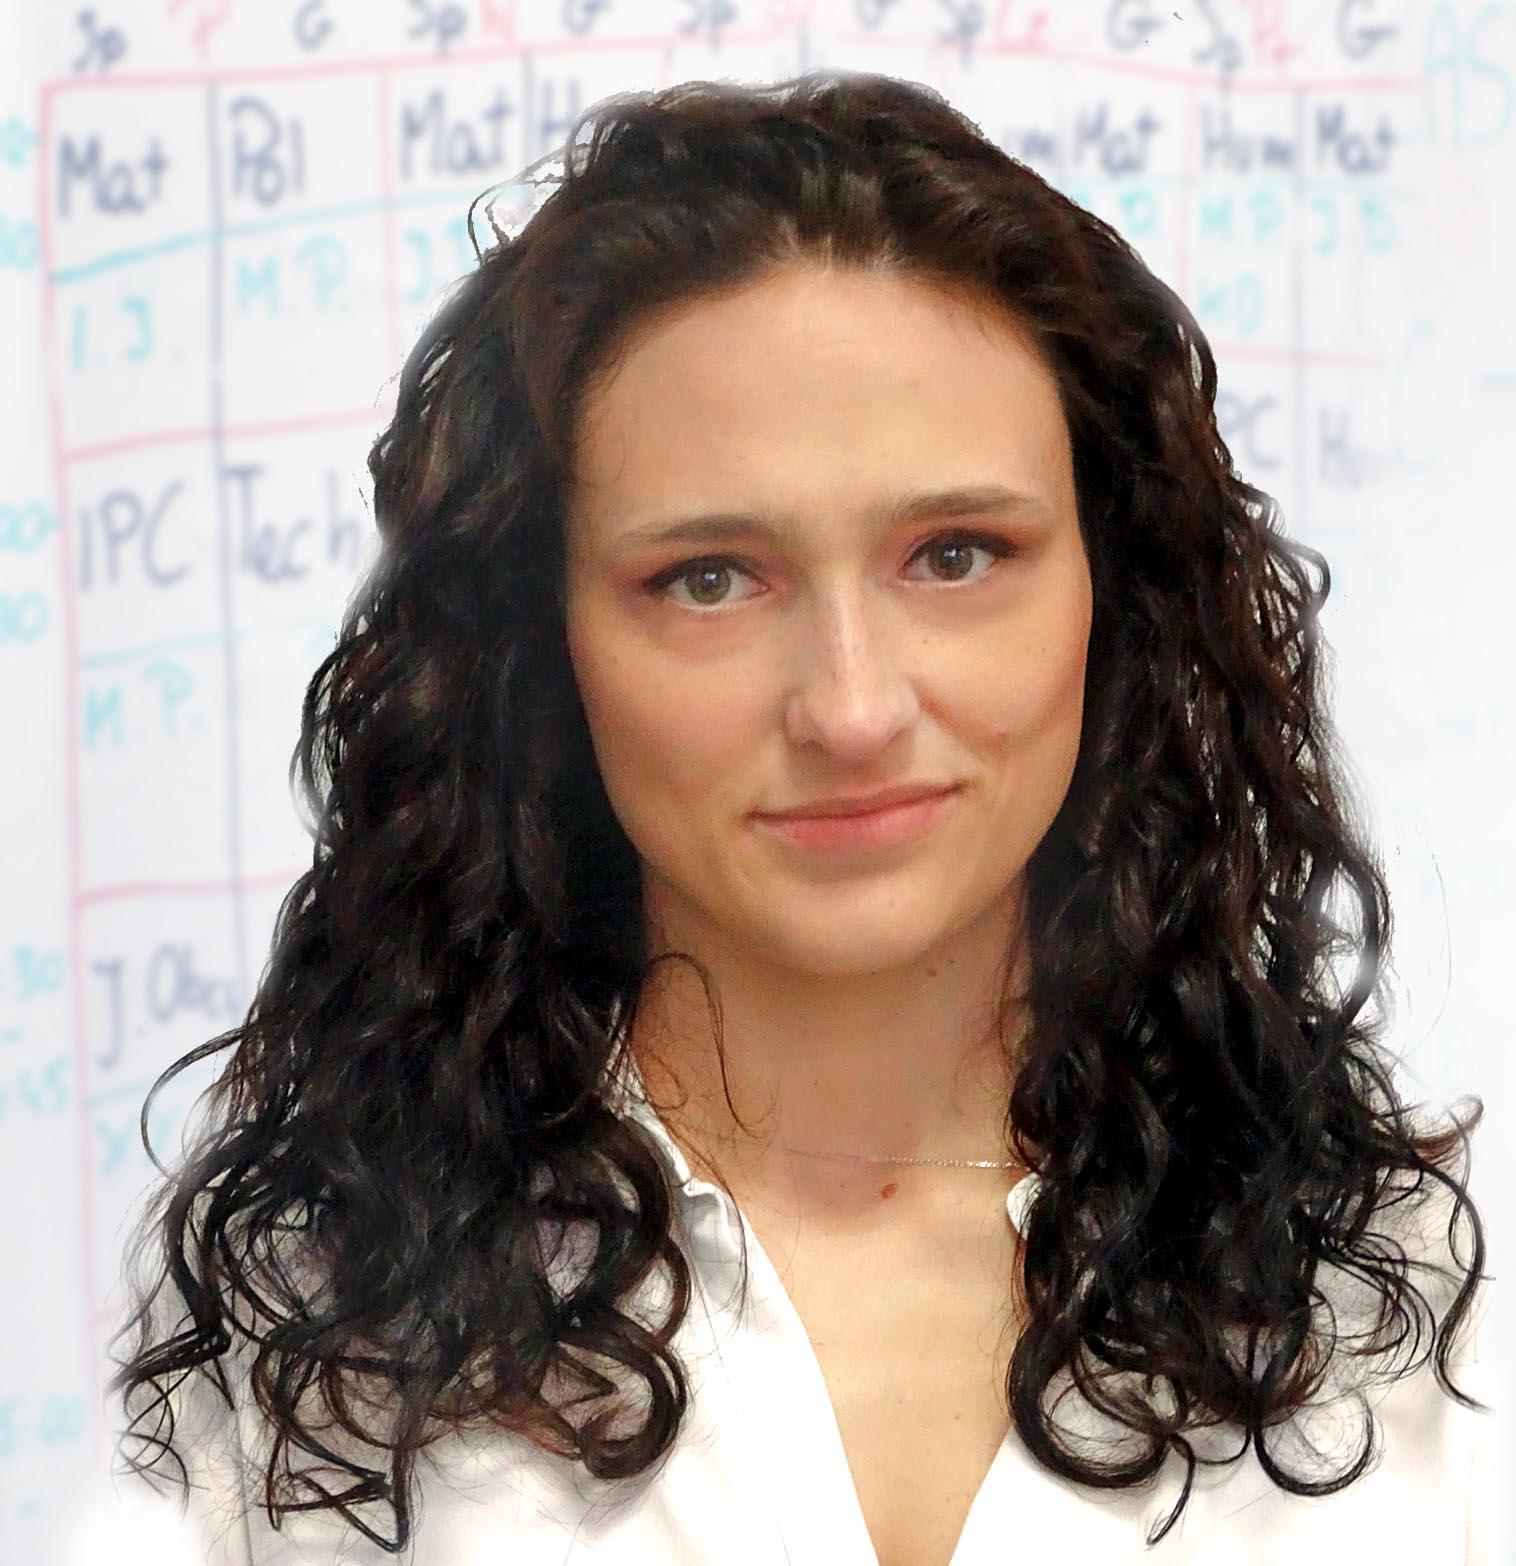 Natalia Rapp